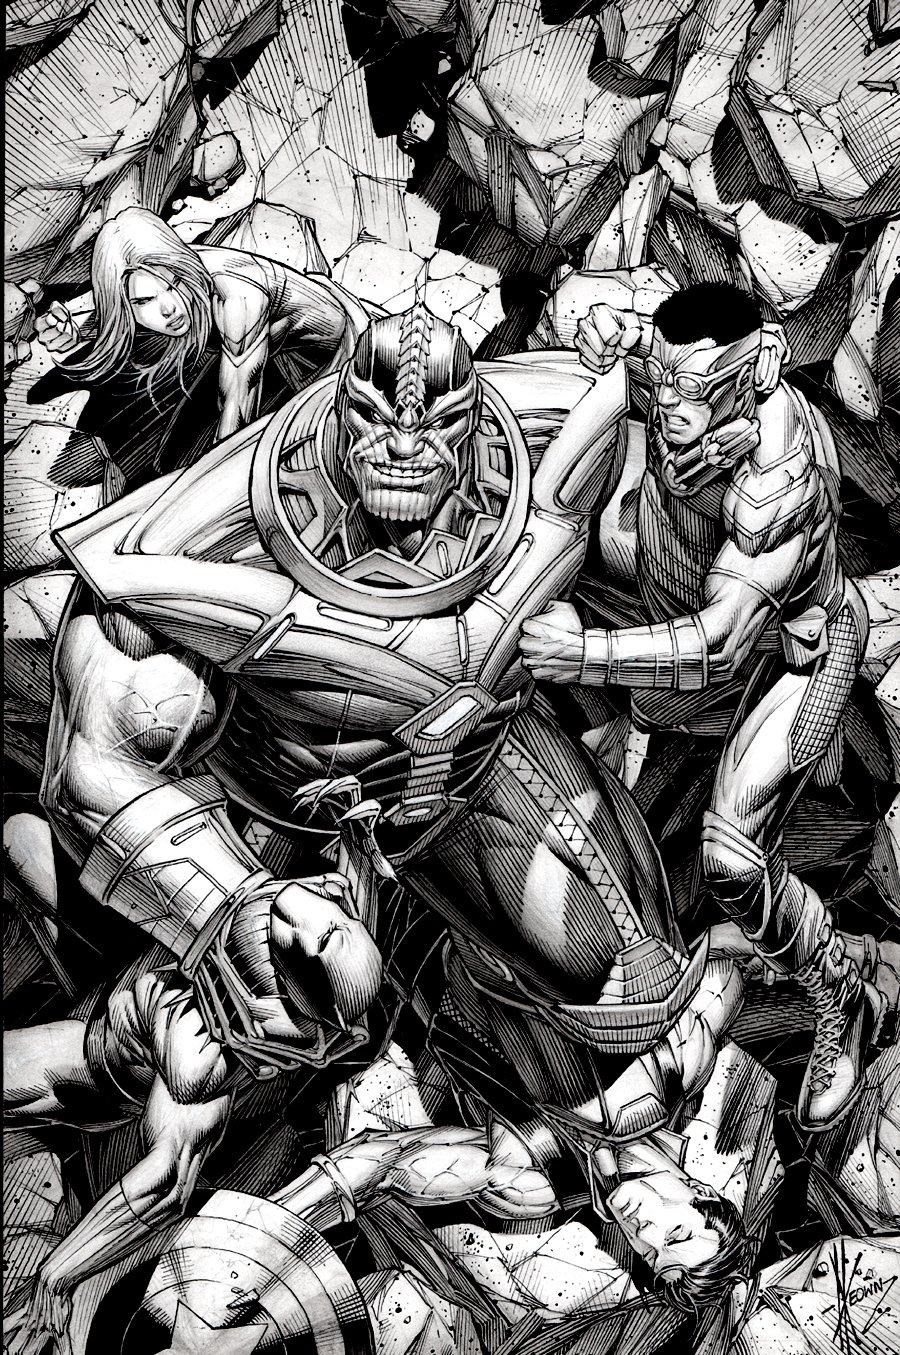 Avengers #40 Cover (THANOS DESTROYS THE AVENGERS!) 2014